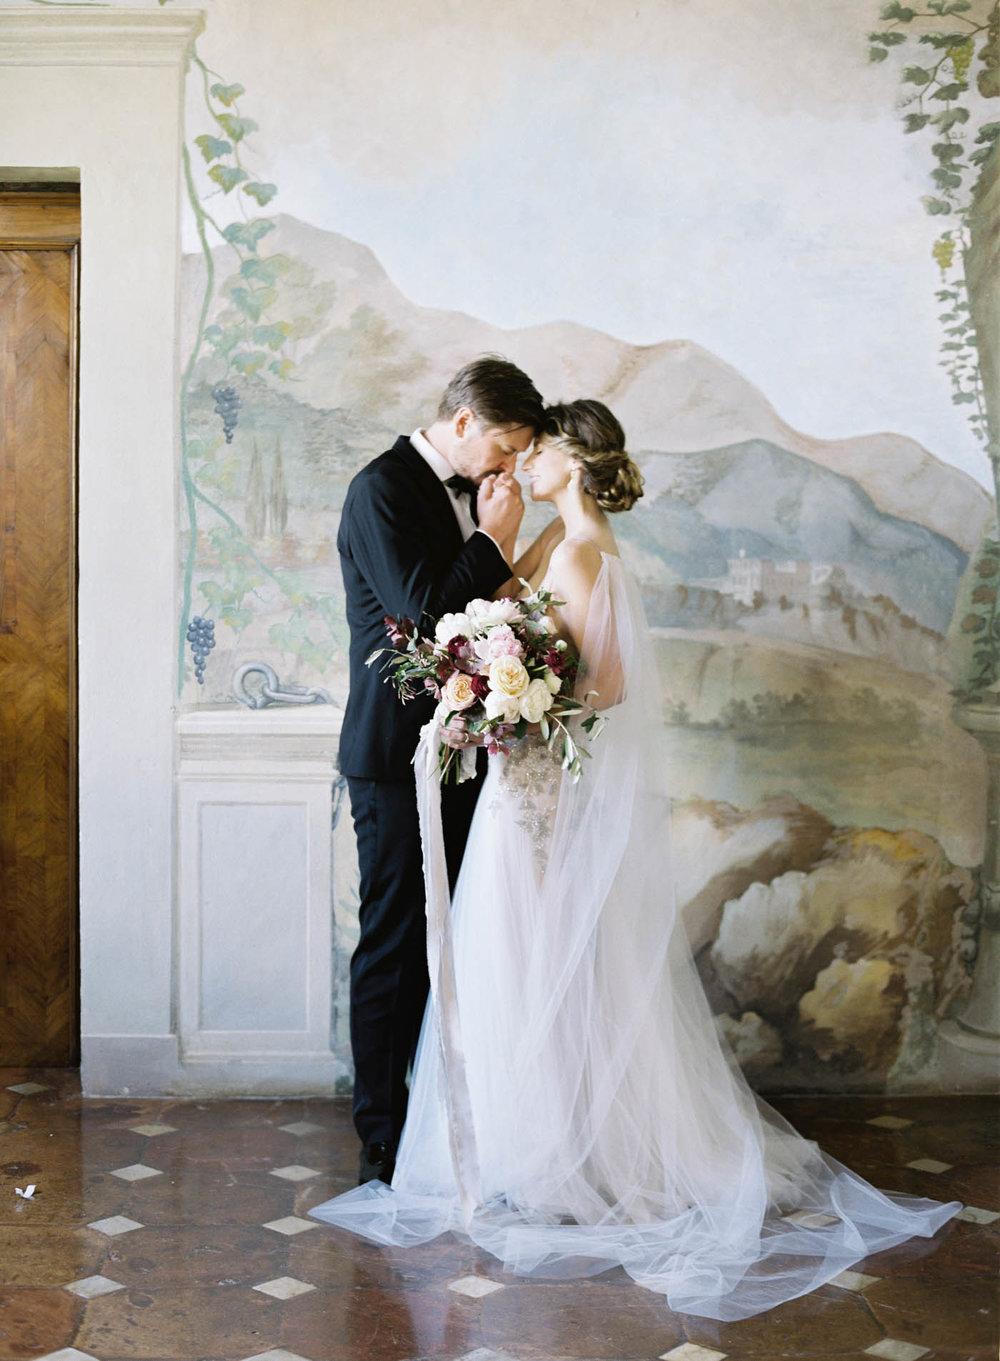 Villa_Cetinale_Wedding-24-Jen_Huang-ElanJacob-190-Jen_Huang-007308-R1-012.jpg